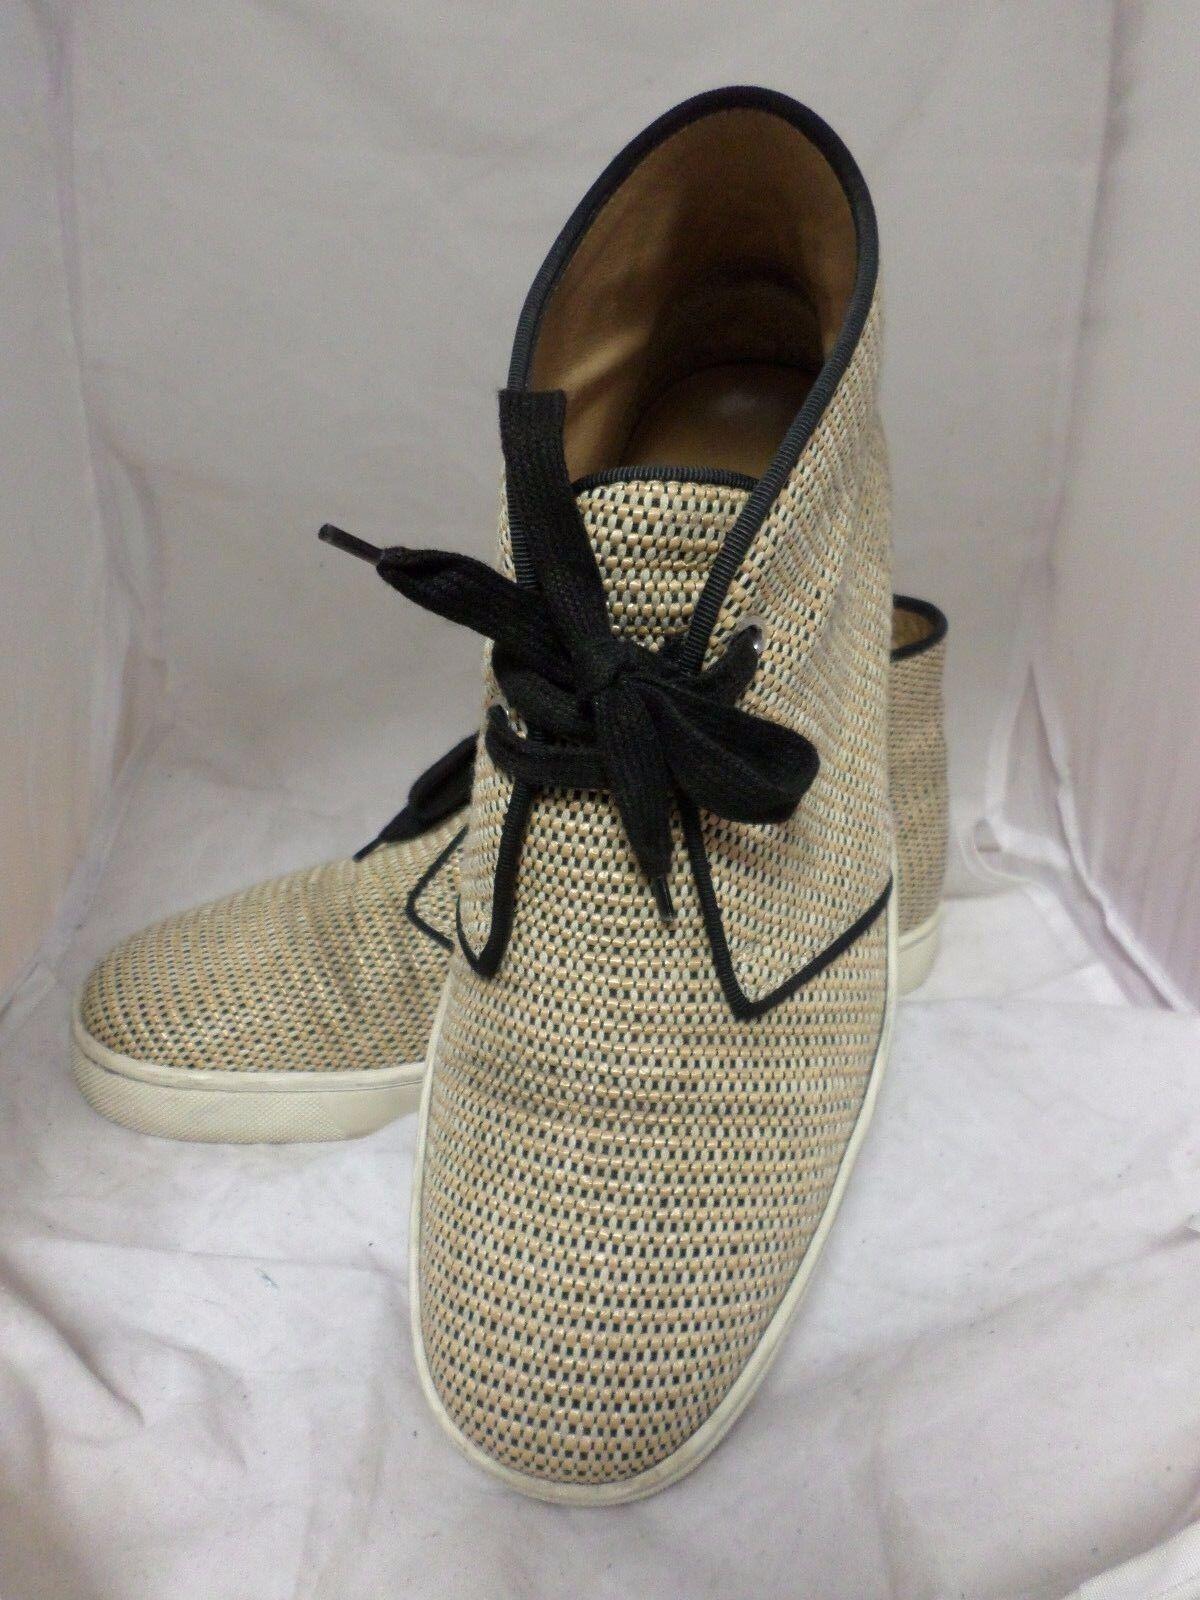 Christian Louboutin Tan Nono Coton Raphia Chaussures UK 7.5 EU 41.5 LN07 60 sales